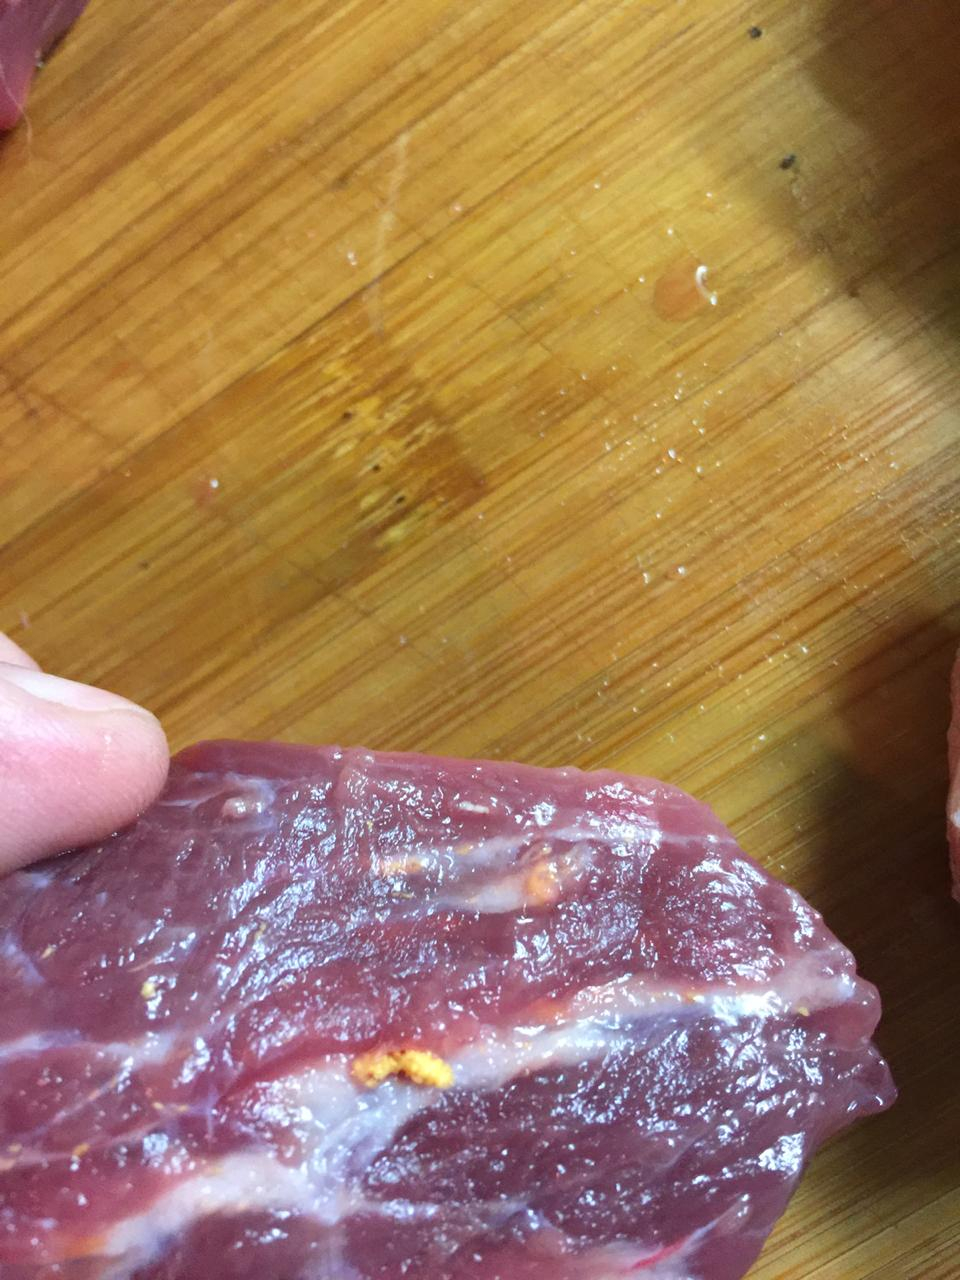 Азбука Вкуса - Мясо с желтыми вкраплениями